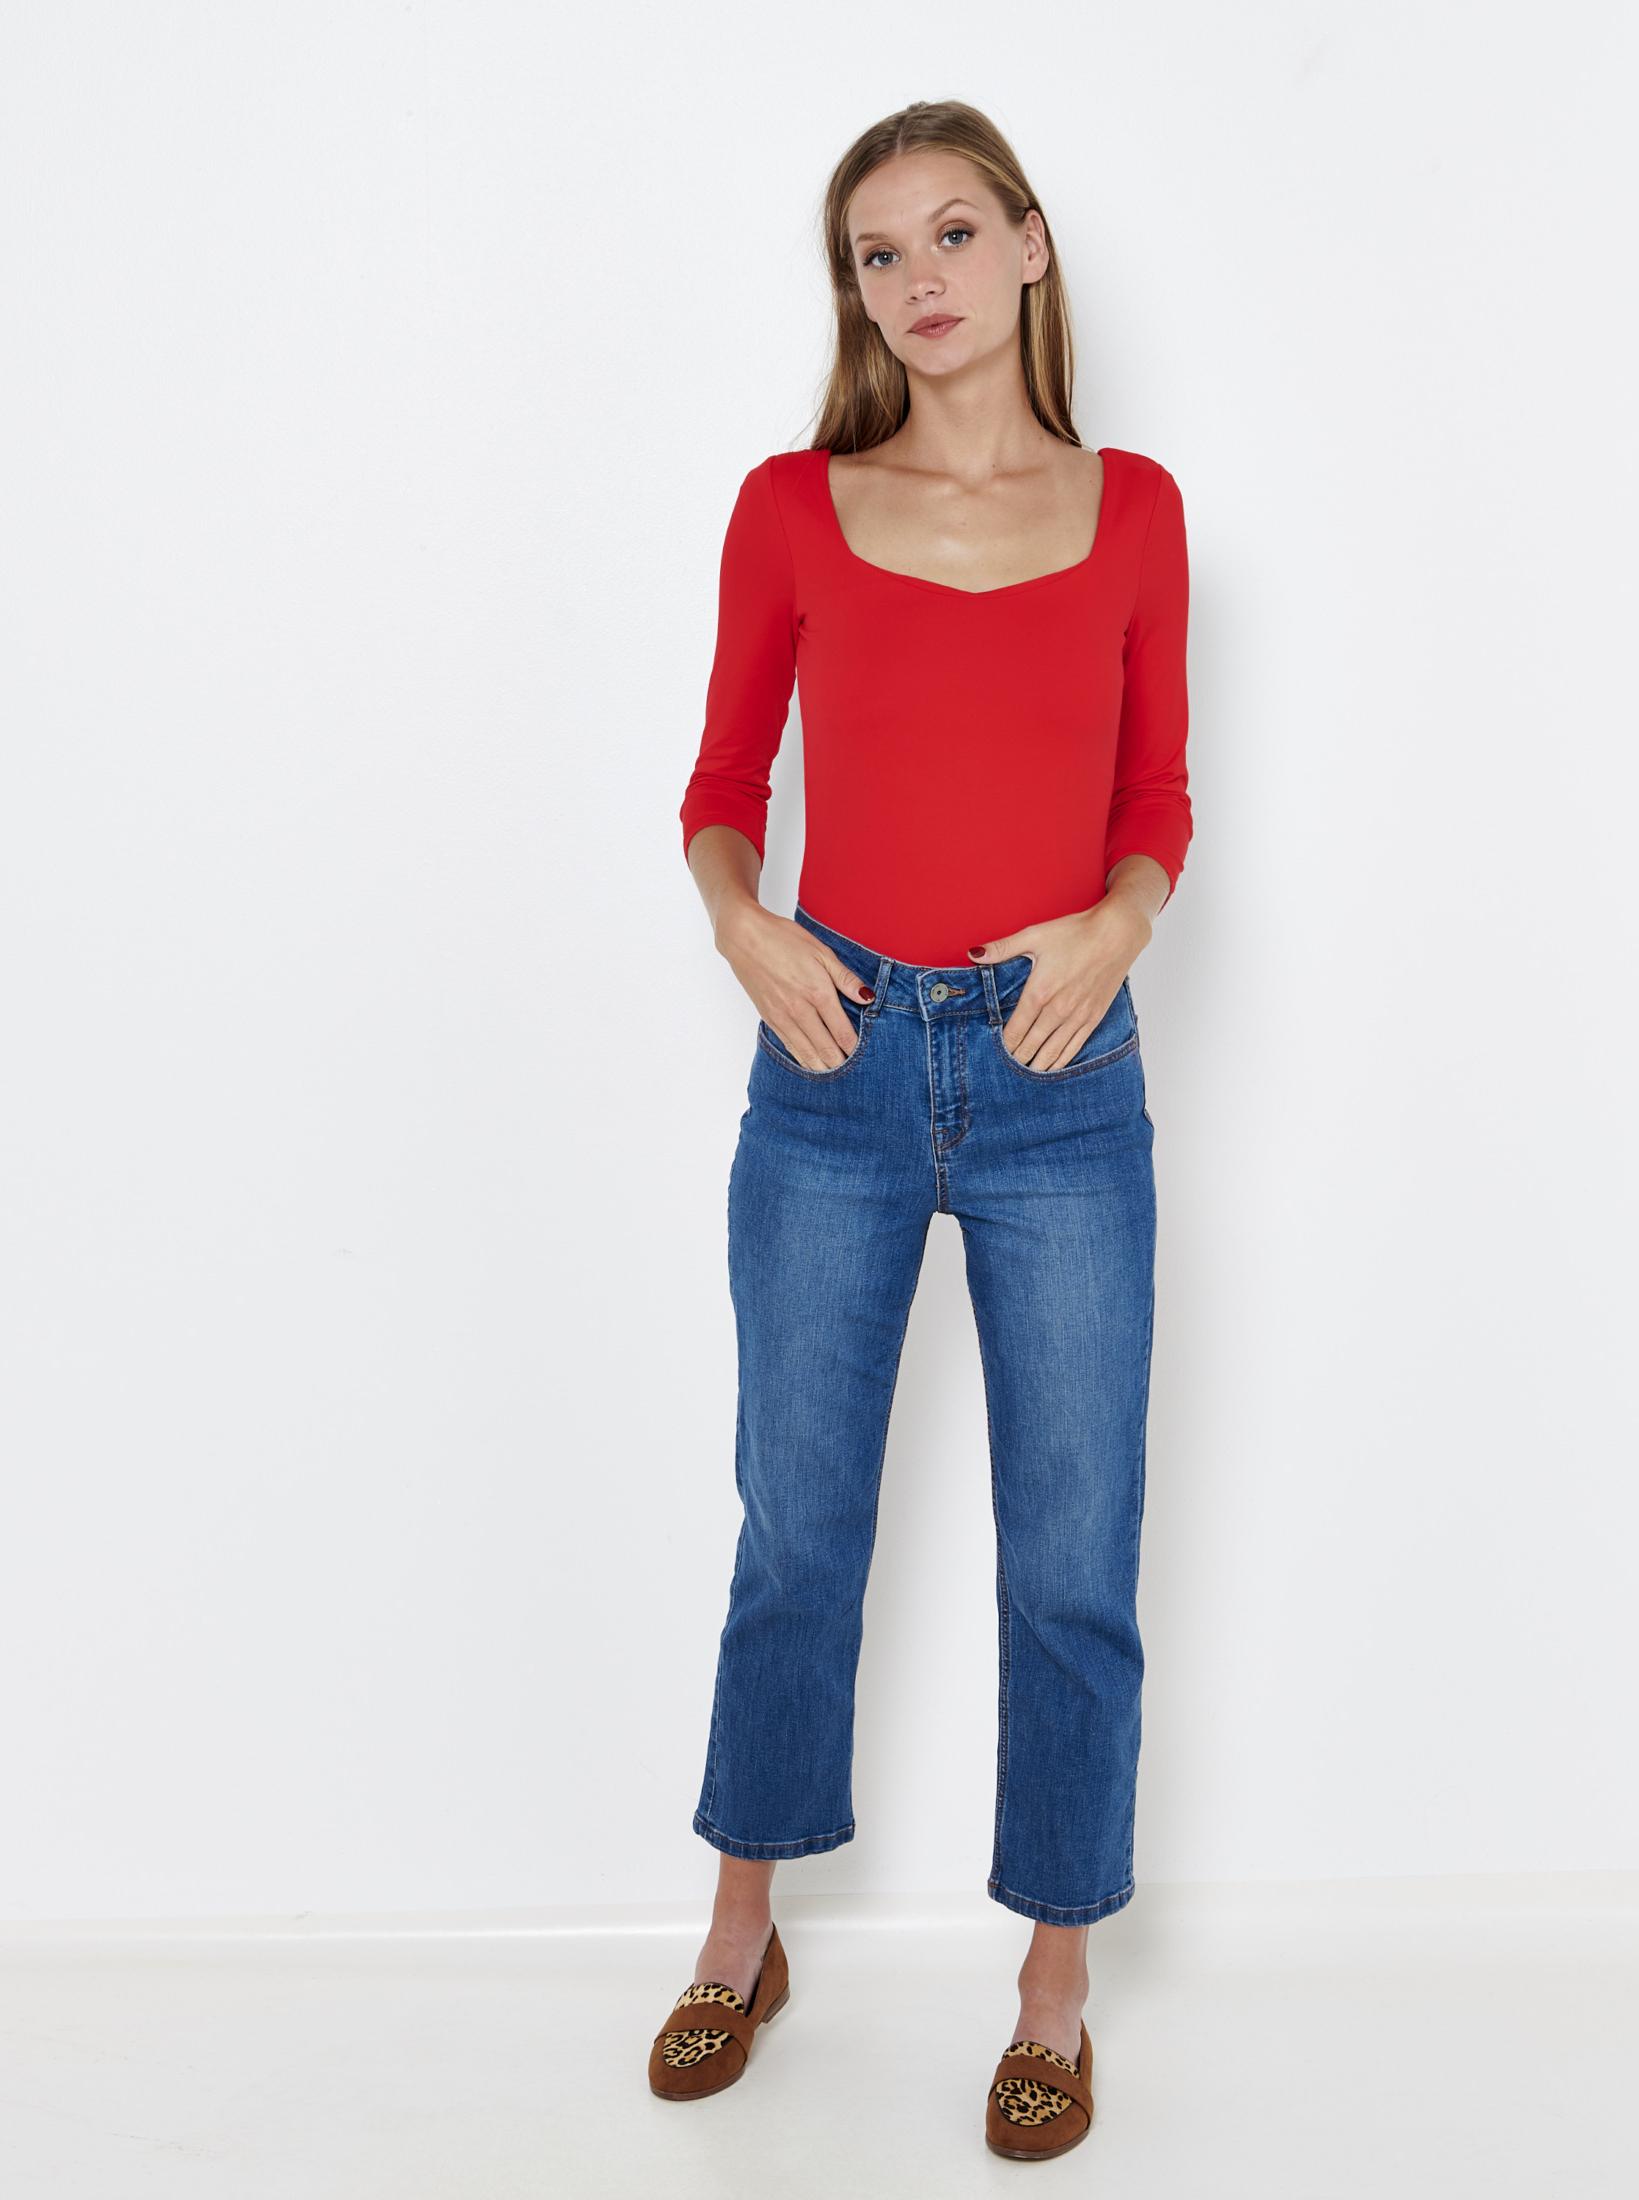 CAMAIEU Maglietta donna rosso